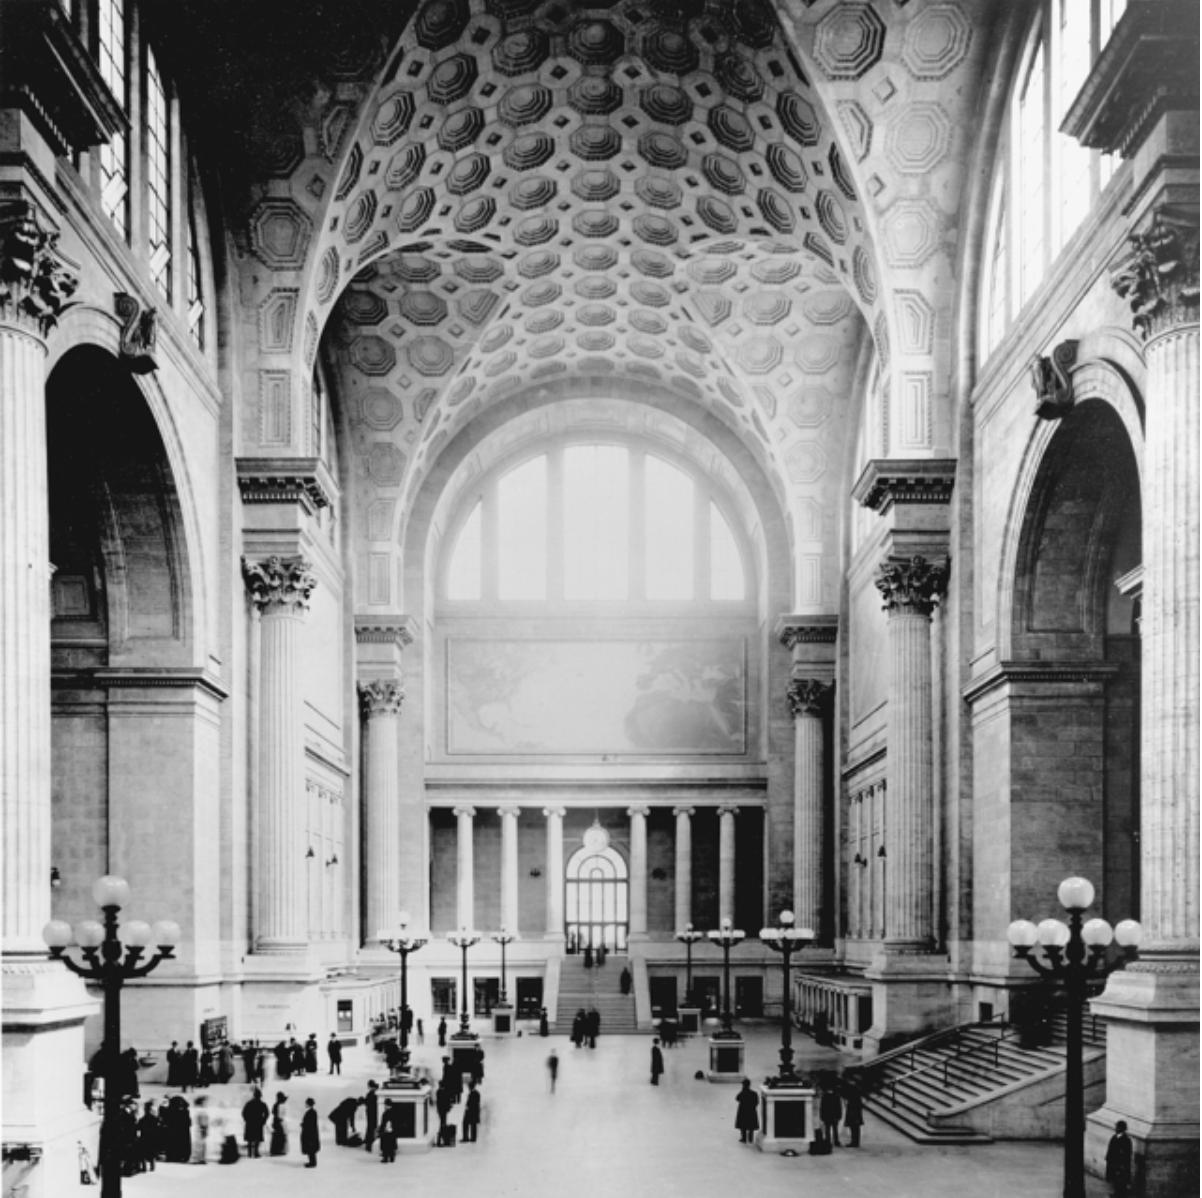 The original Penn Station, a…